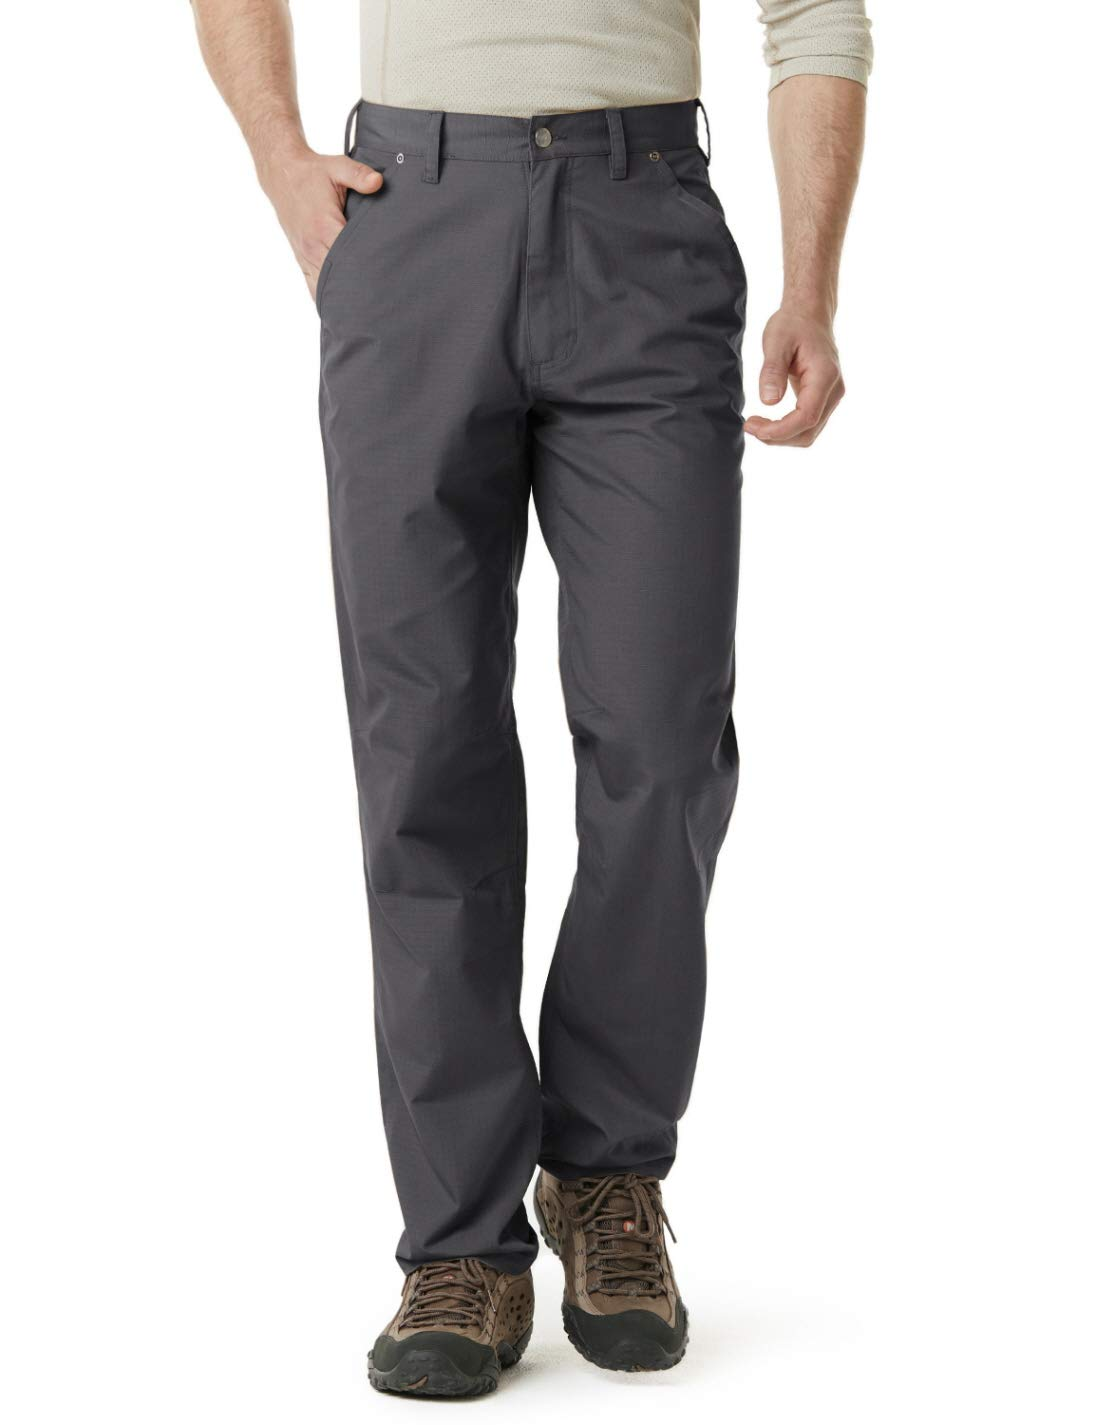 CQR Men's Ripstop Work Pants, Water Repellent Tactical Pants, Outdoor Utility Operator EDC Straight/Cargo Pants